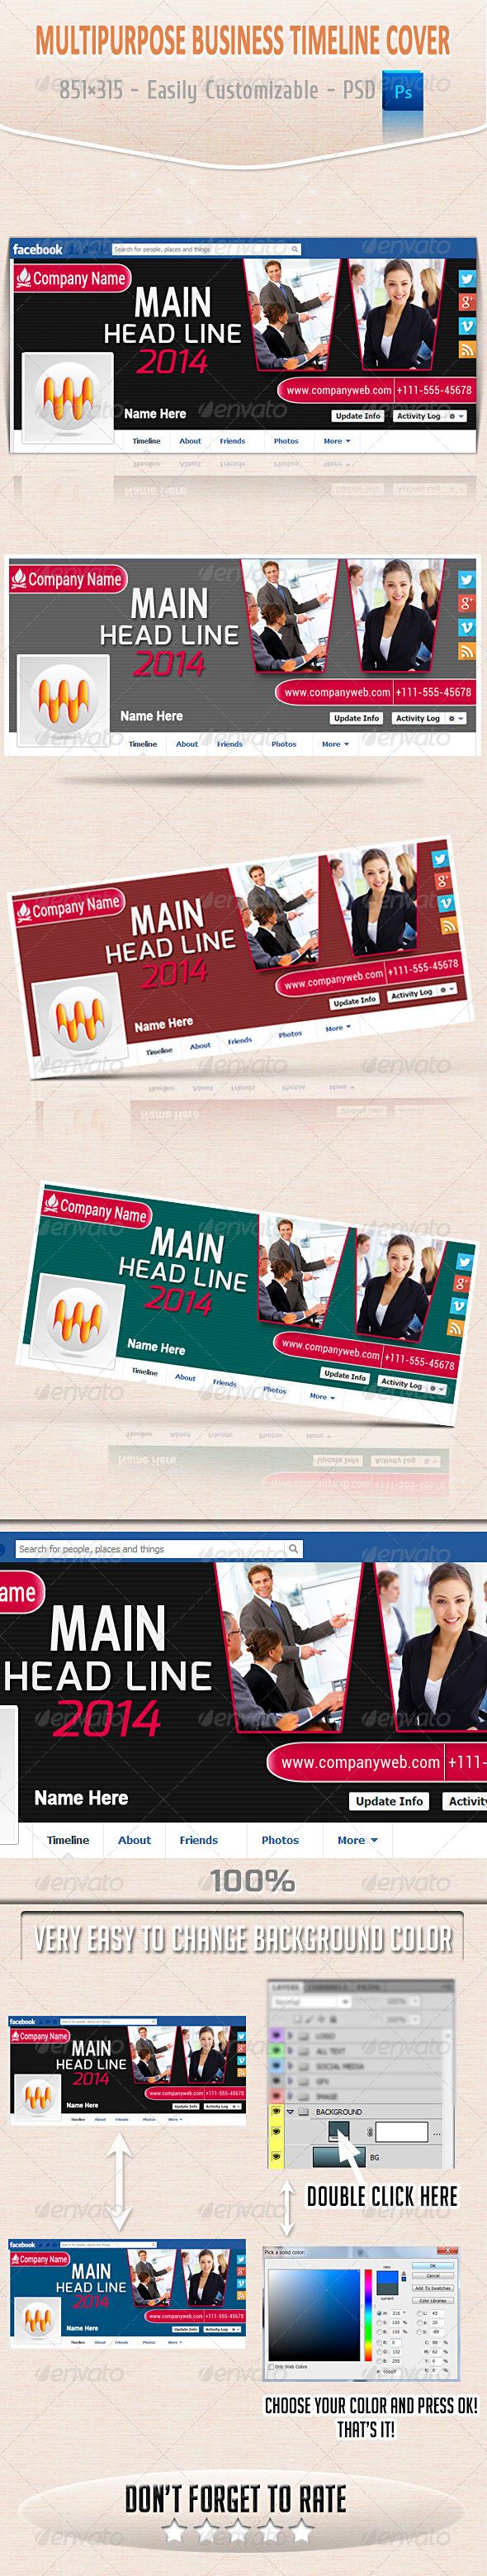 Multipurpose Business Timeline Cover - Facebook Timeline Covers Social Media